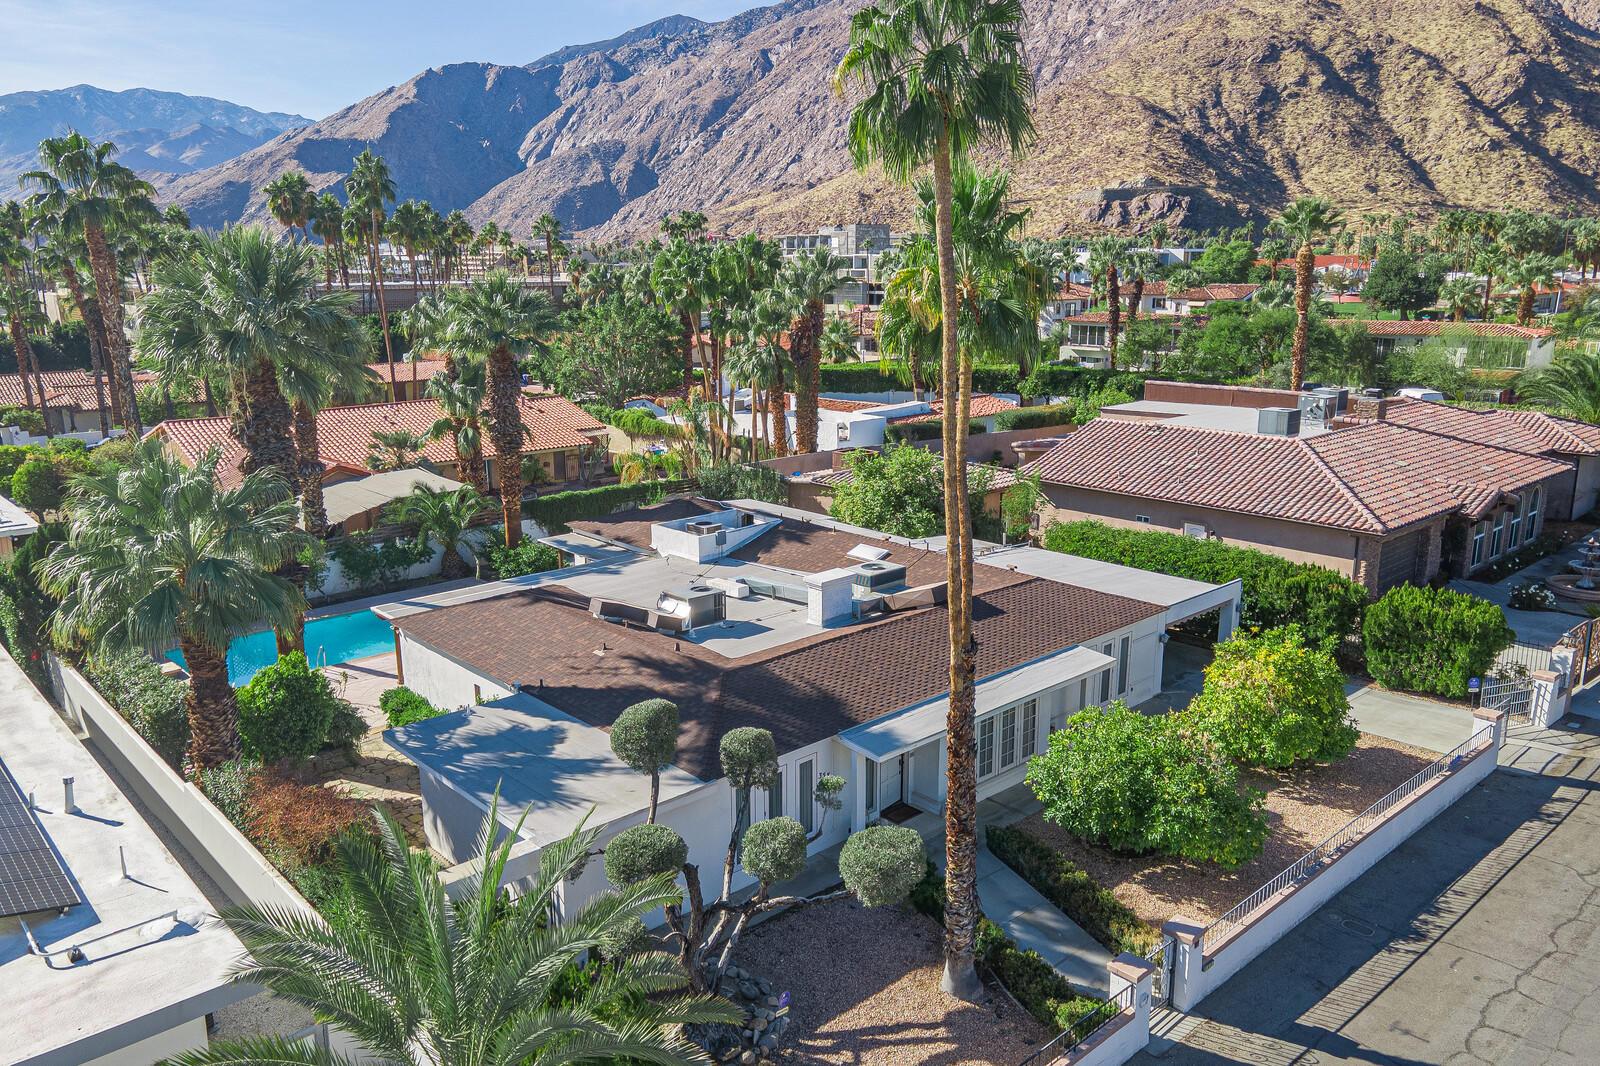 Photo of 355 E Valmonte Sur, Palm Springs, CA 92262